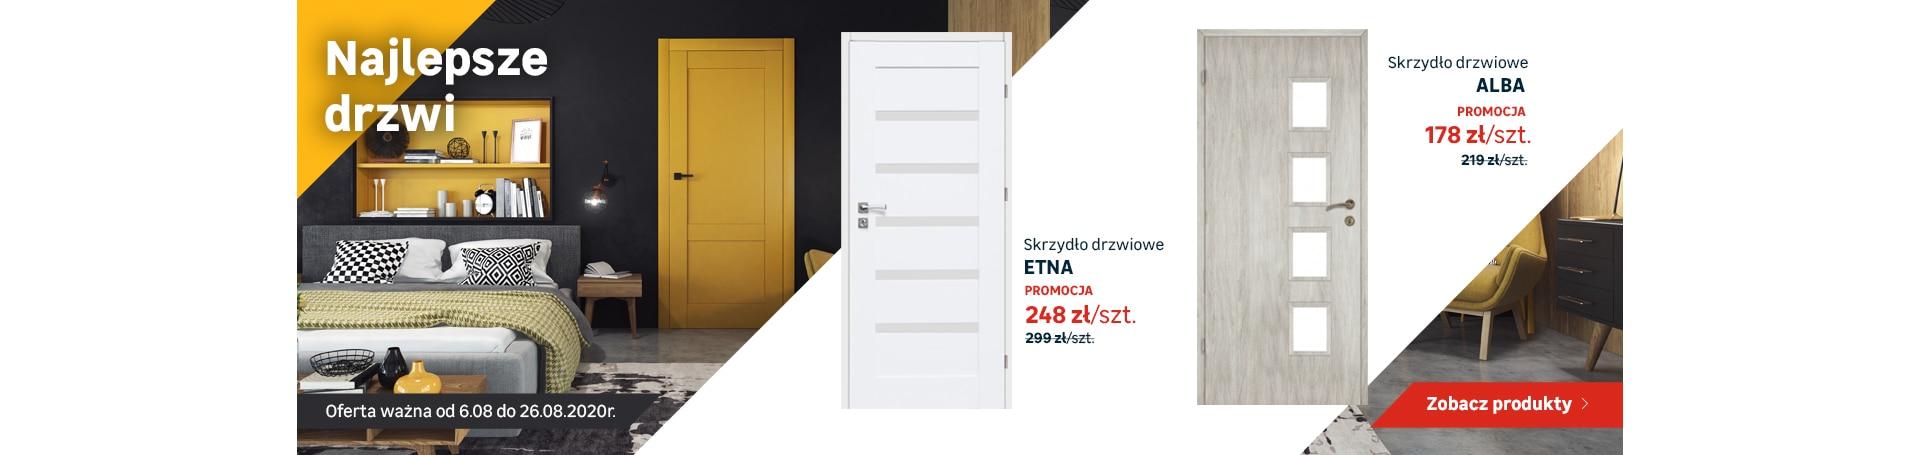 ps-drzwi-08-26.08.2020-1920x455